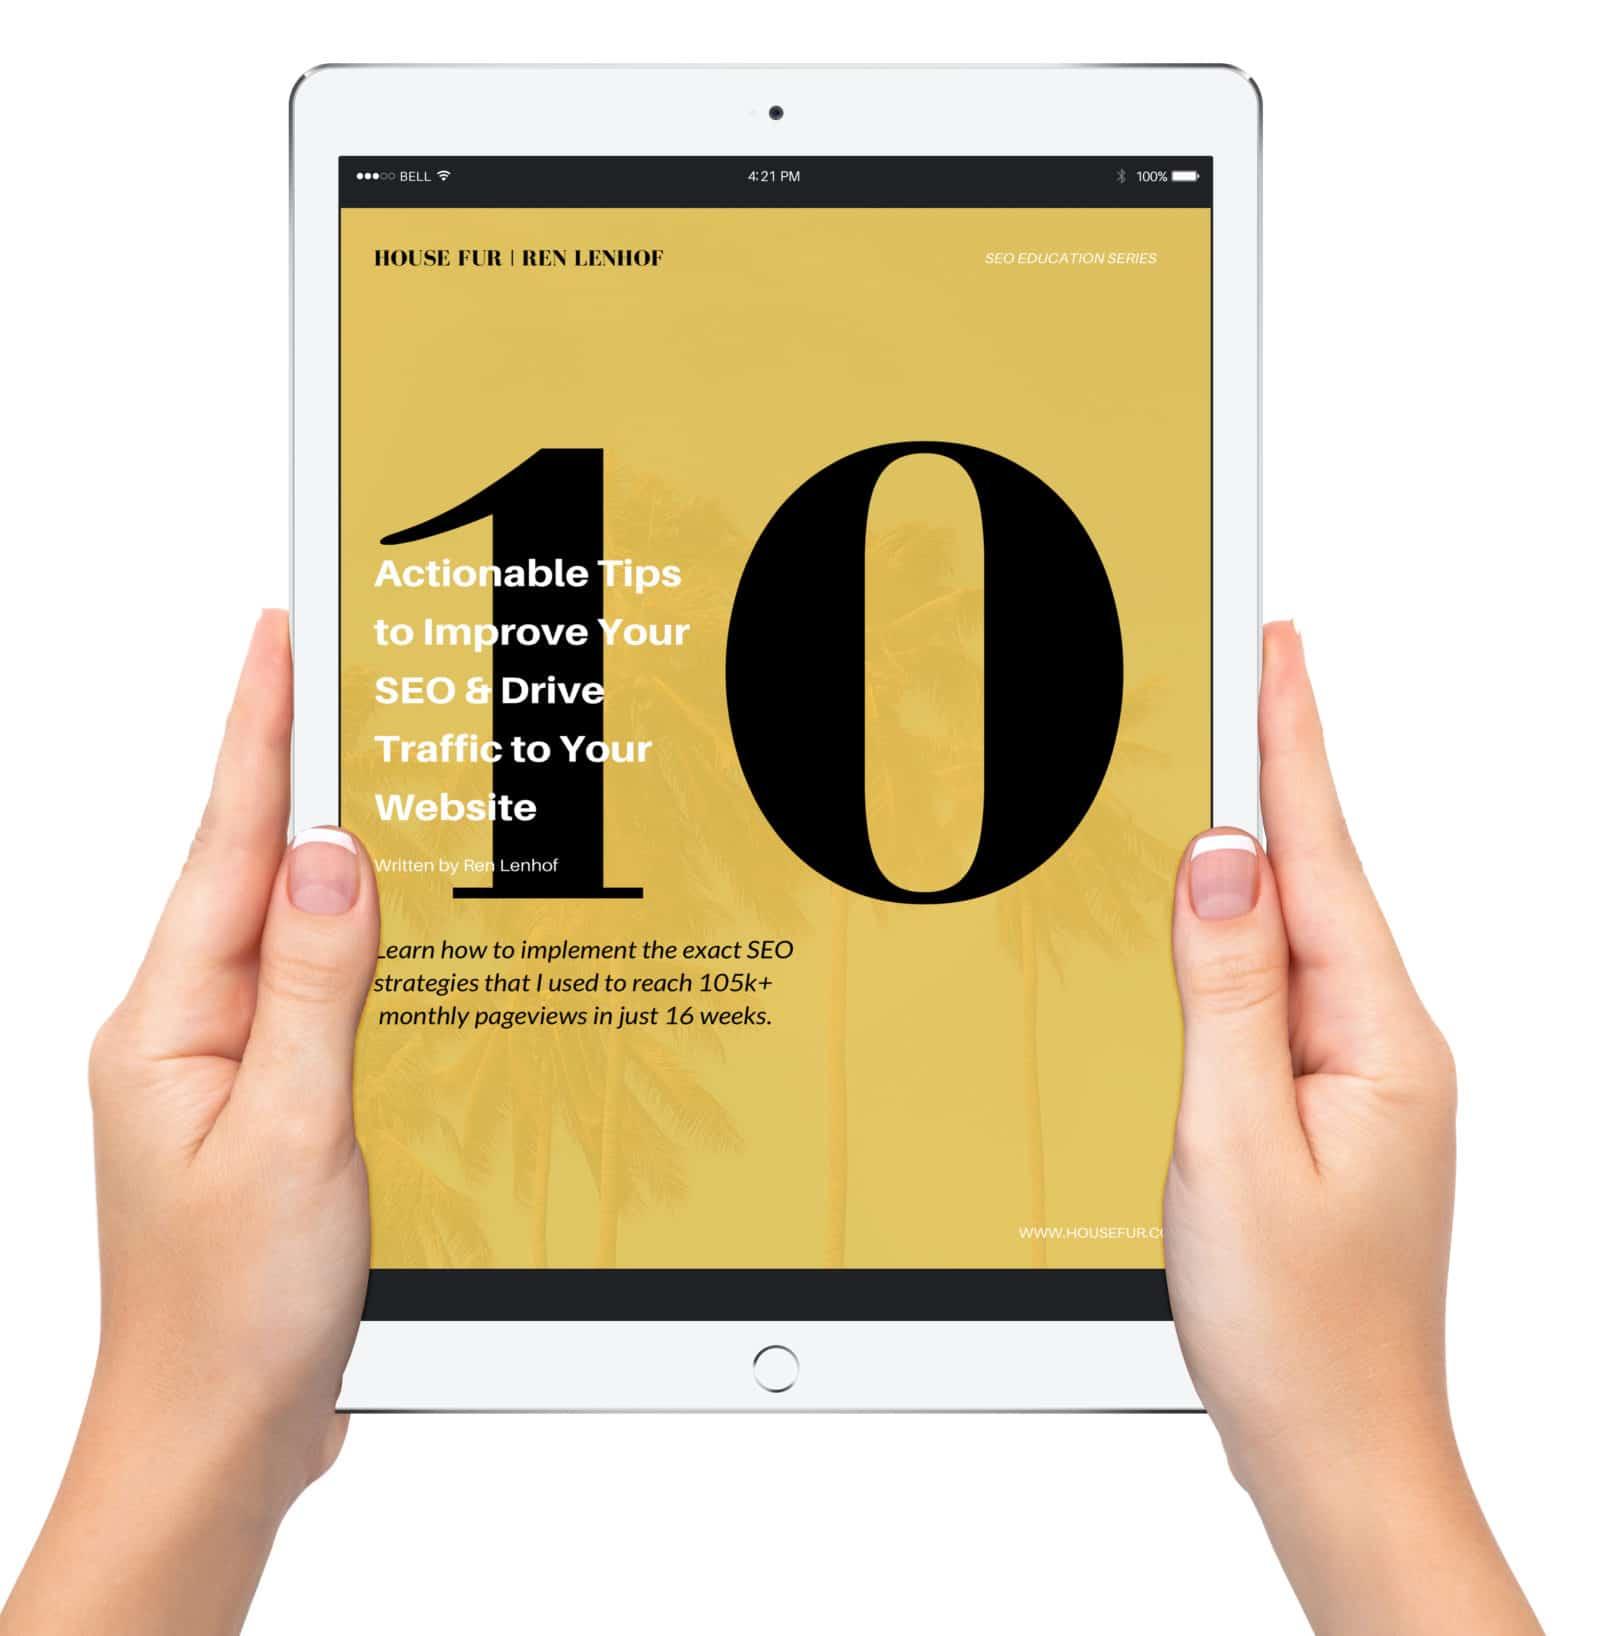 SEO ebook by Ren Lenhof for more website traffic